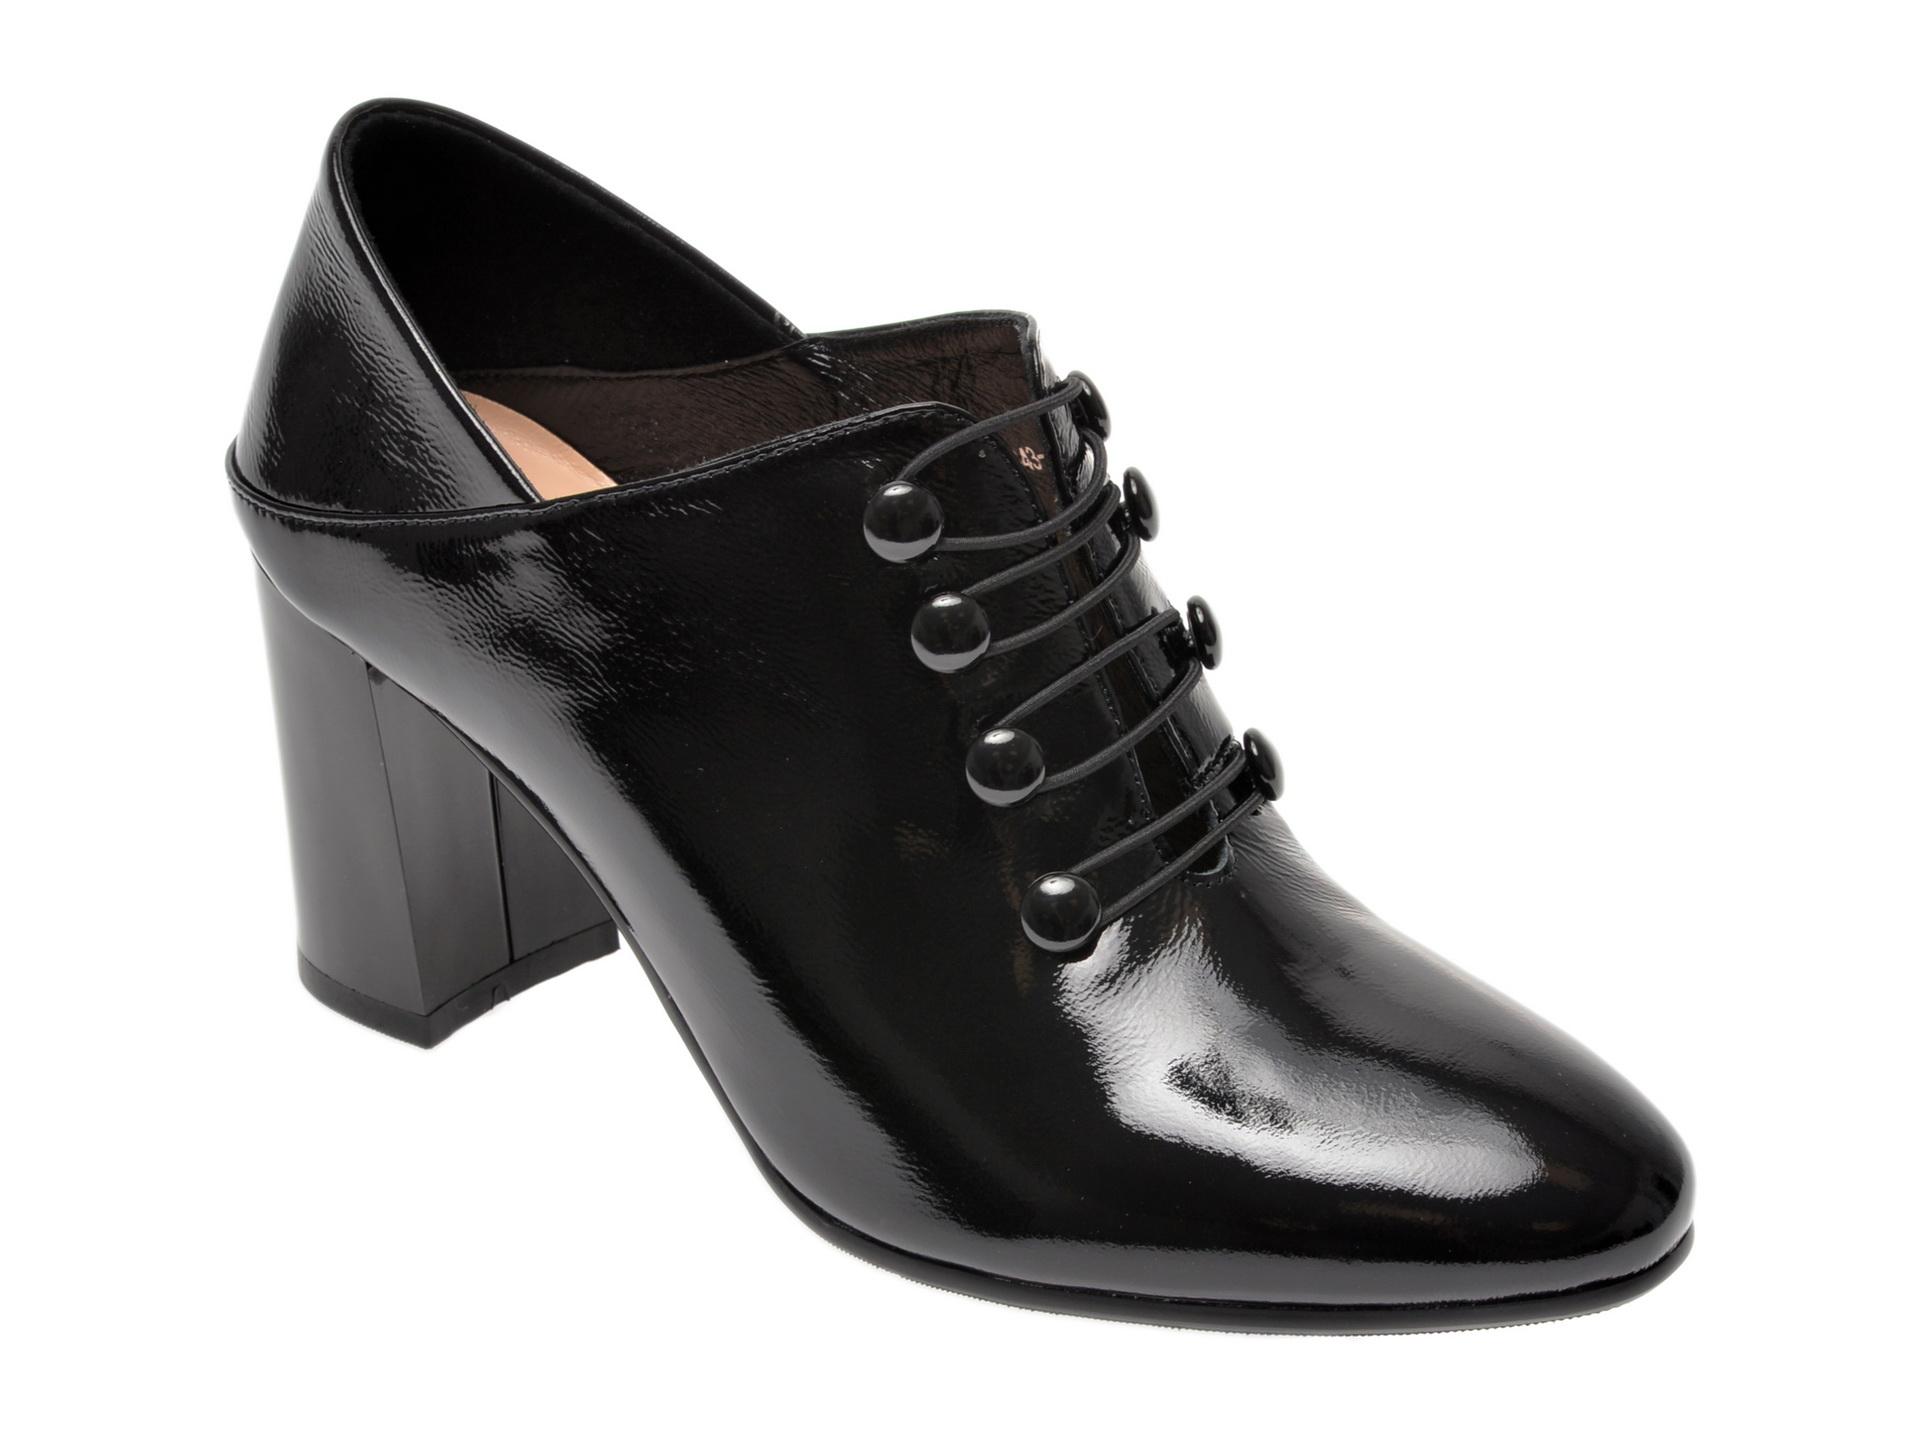 Pantofi EPICA negri, 6054834, din piele naturala lacuita imagine